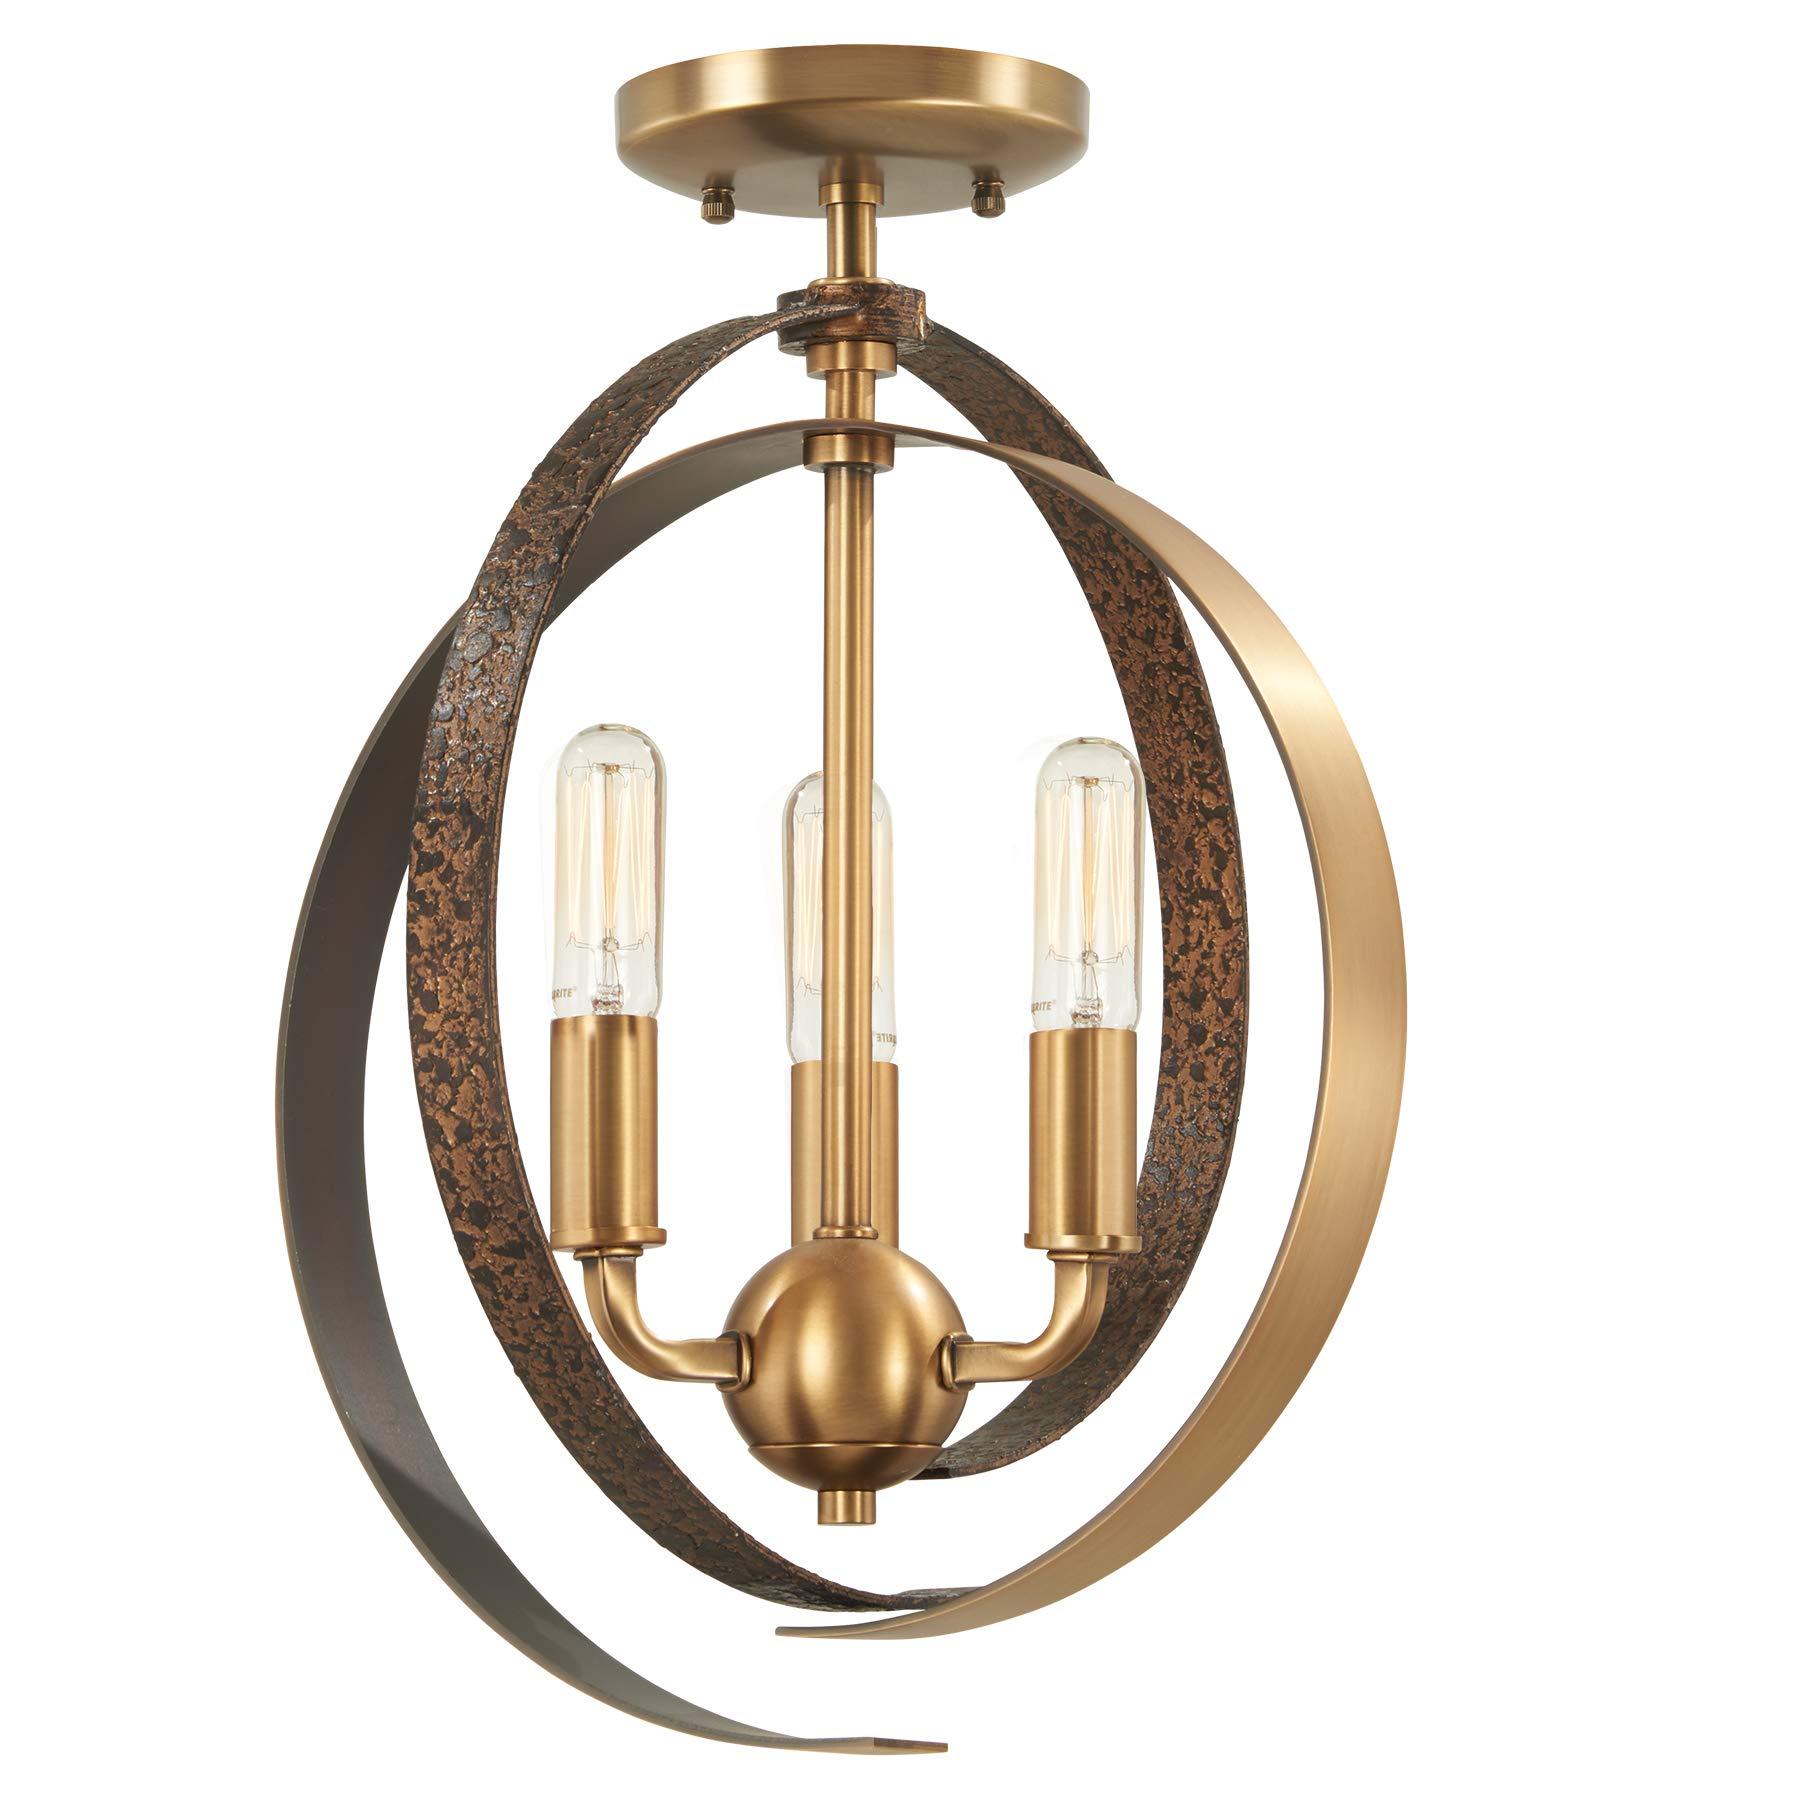 Minka Lavery Pendant Ceiling Lighting 4622-099 Criterium, 3-Light 180 Watts, Aged Brass